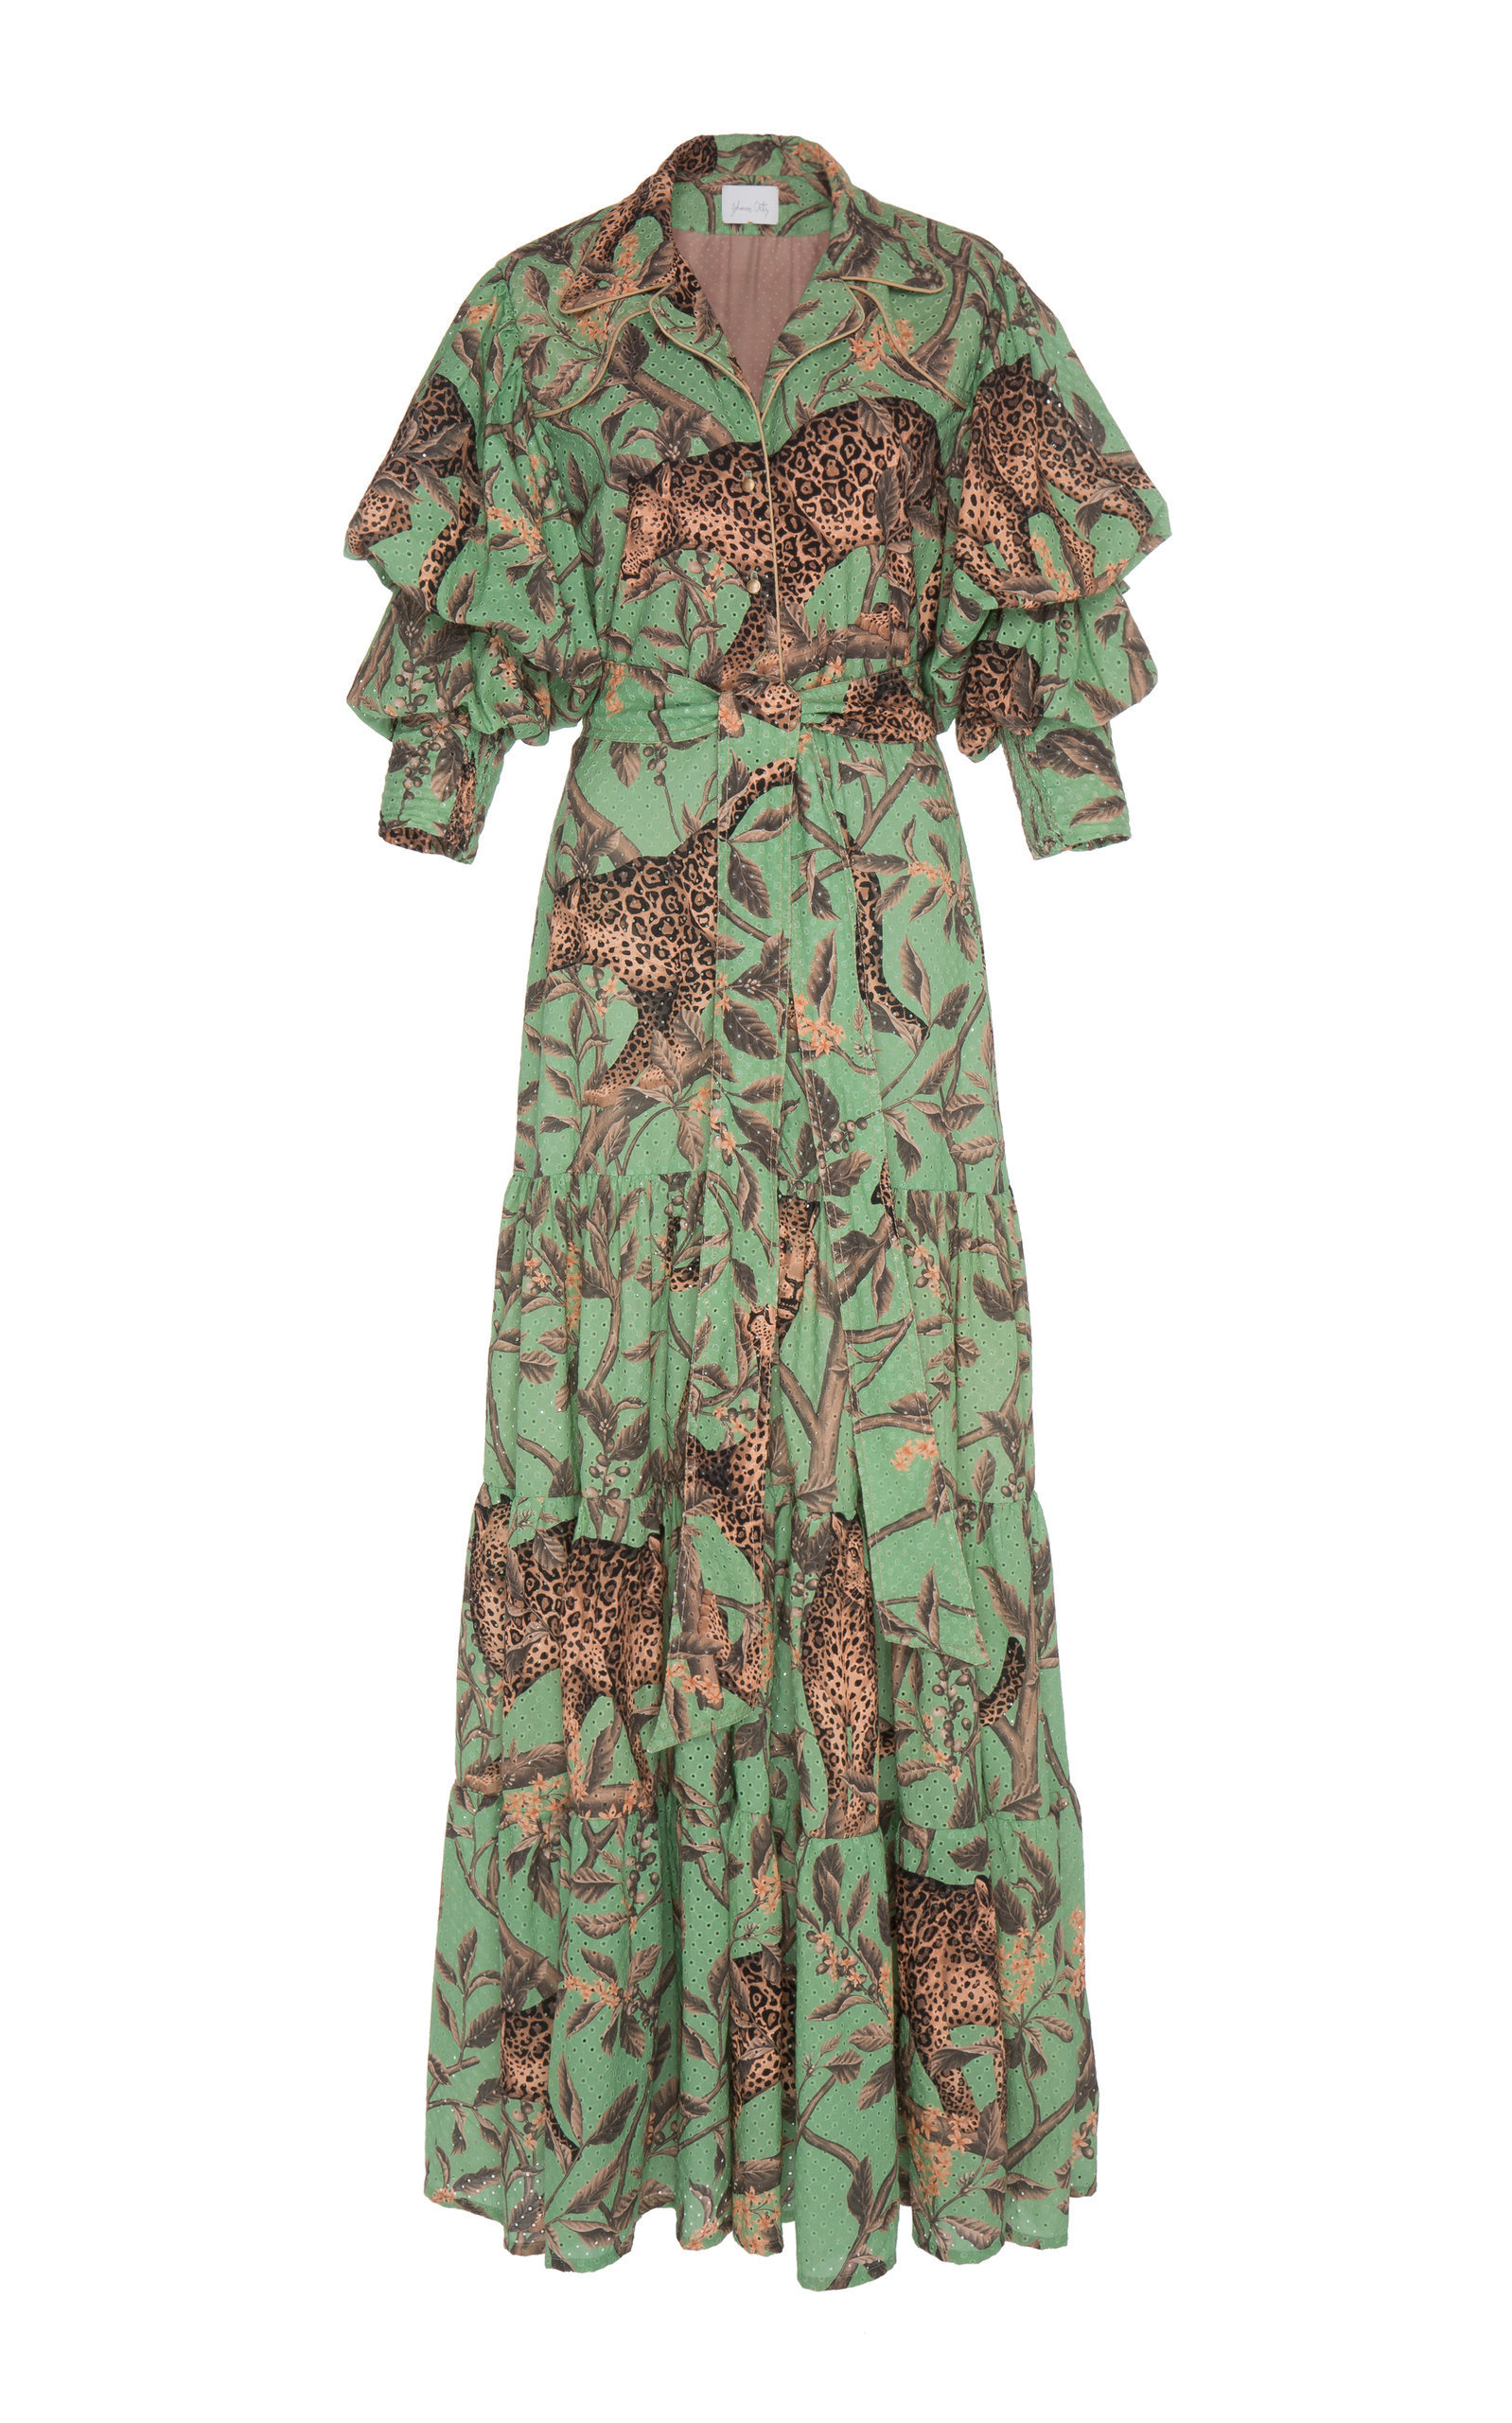 Magestic Safari Printed Eyelet Cotton Maxi Dress | $2,250